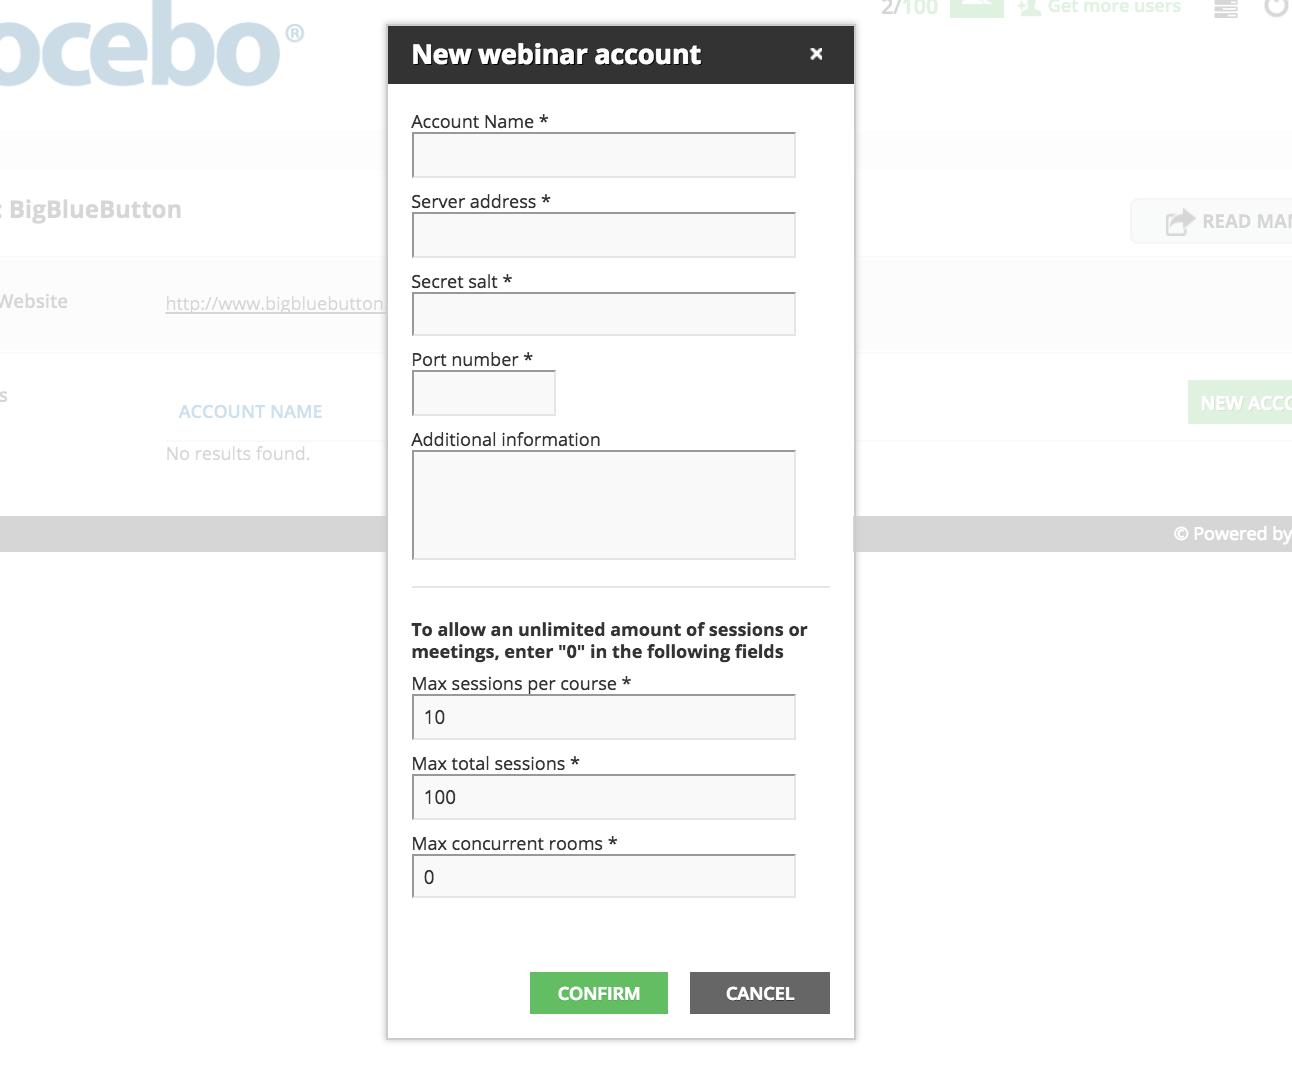 bigbluebutton new webinar account